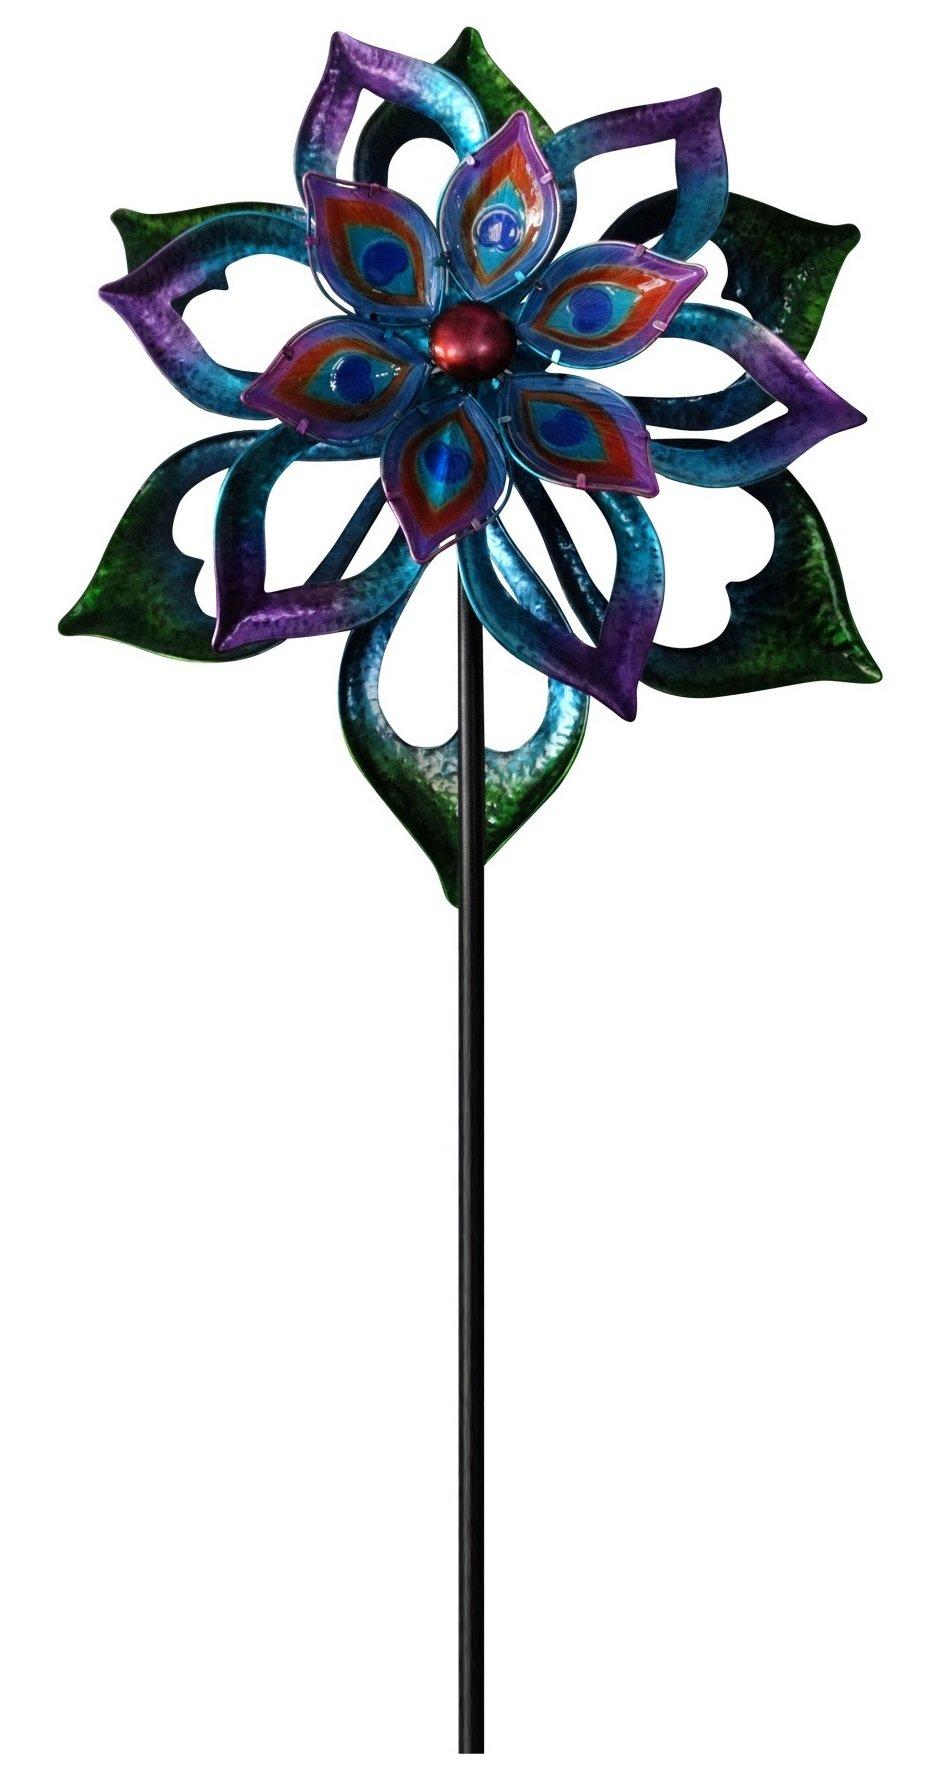 Alpine Corporation KPP424 Metal Double Sided Flower Spinning Garden Stake